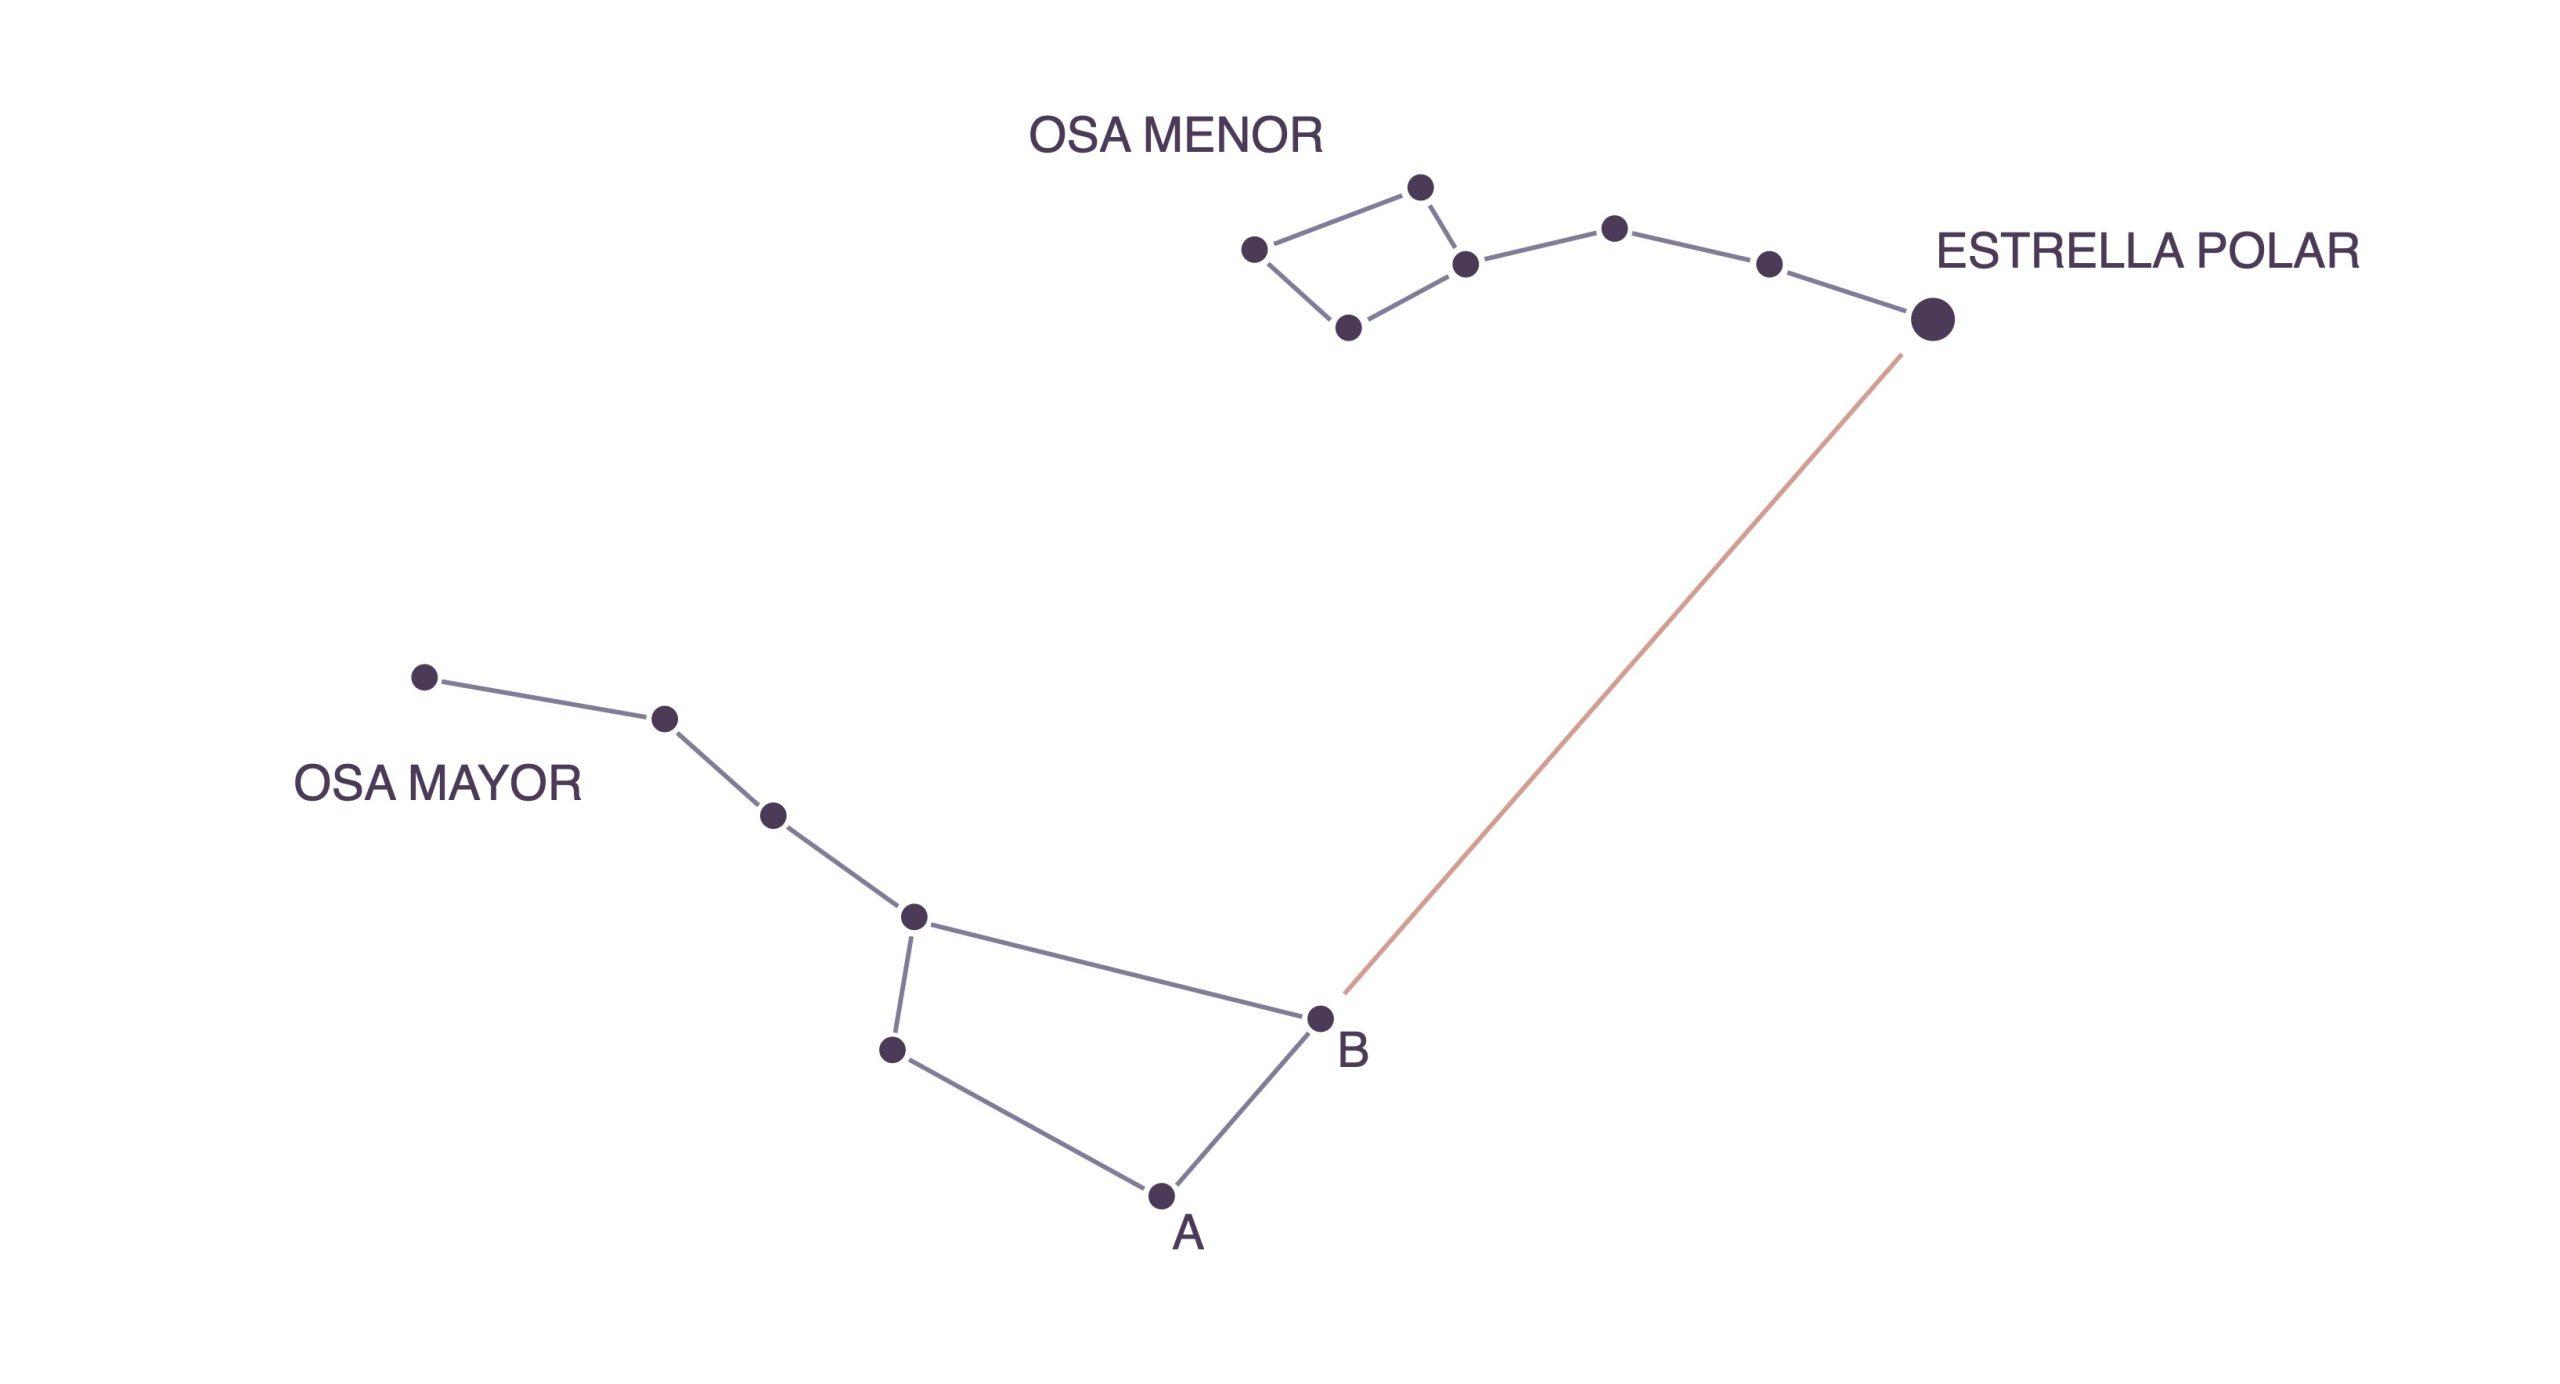 Estrella Polar - Osa Mayor - Osa Menor